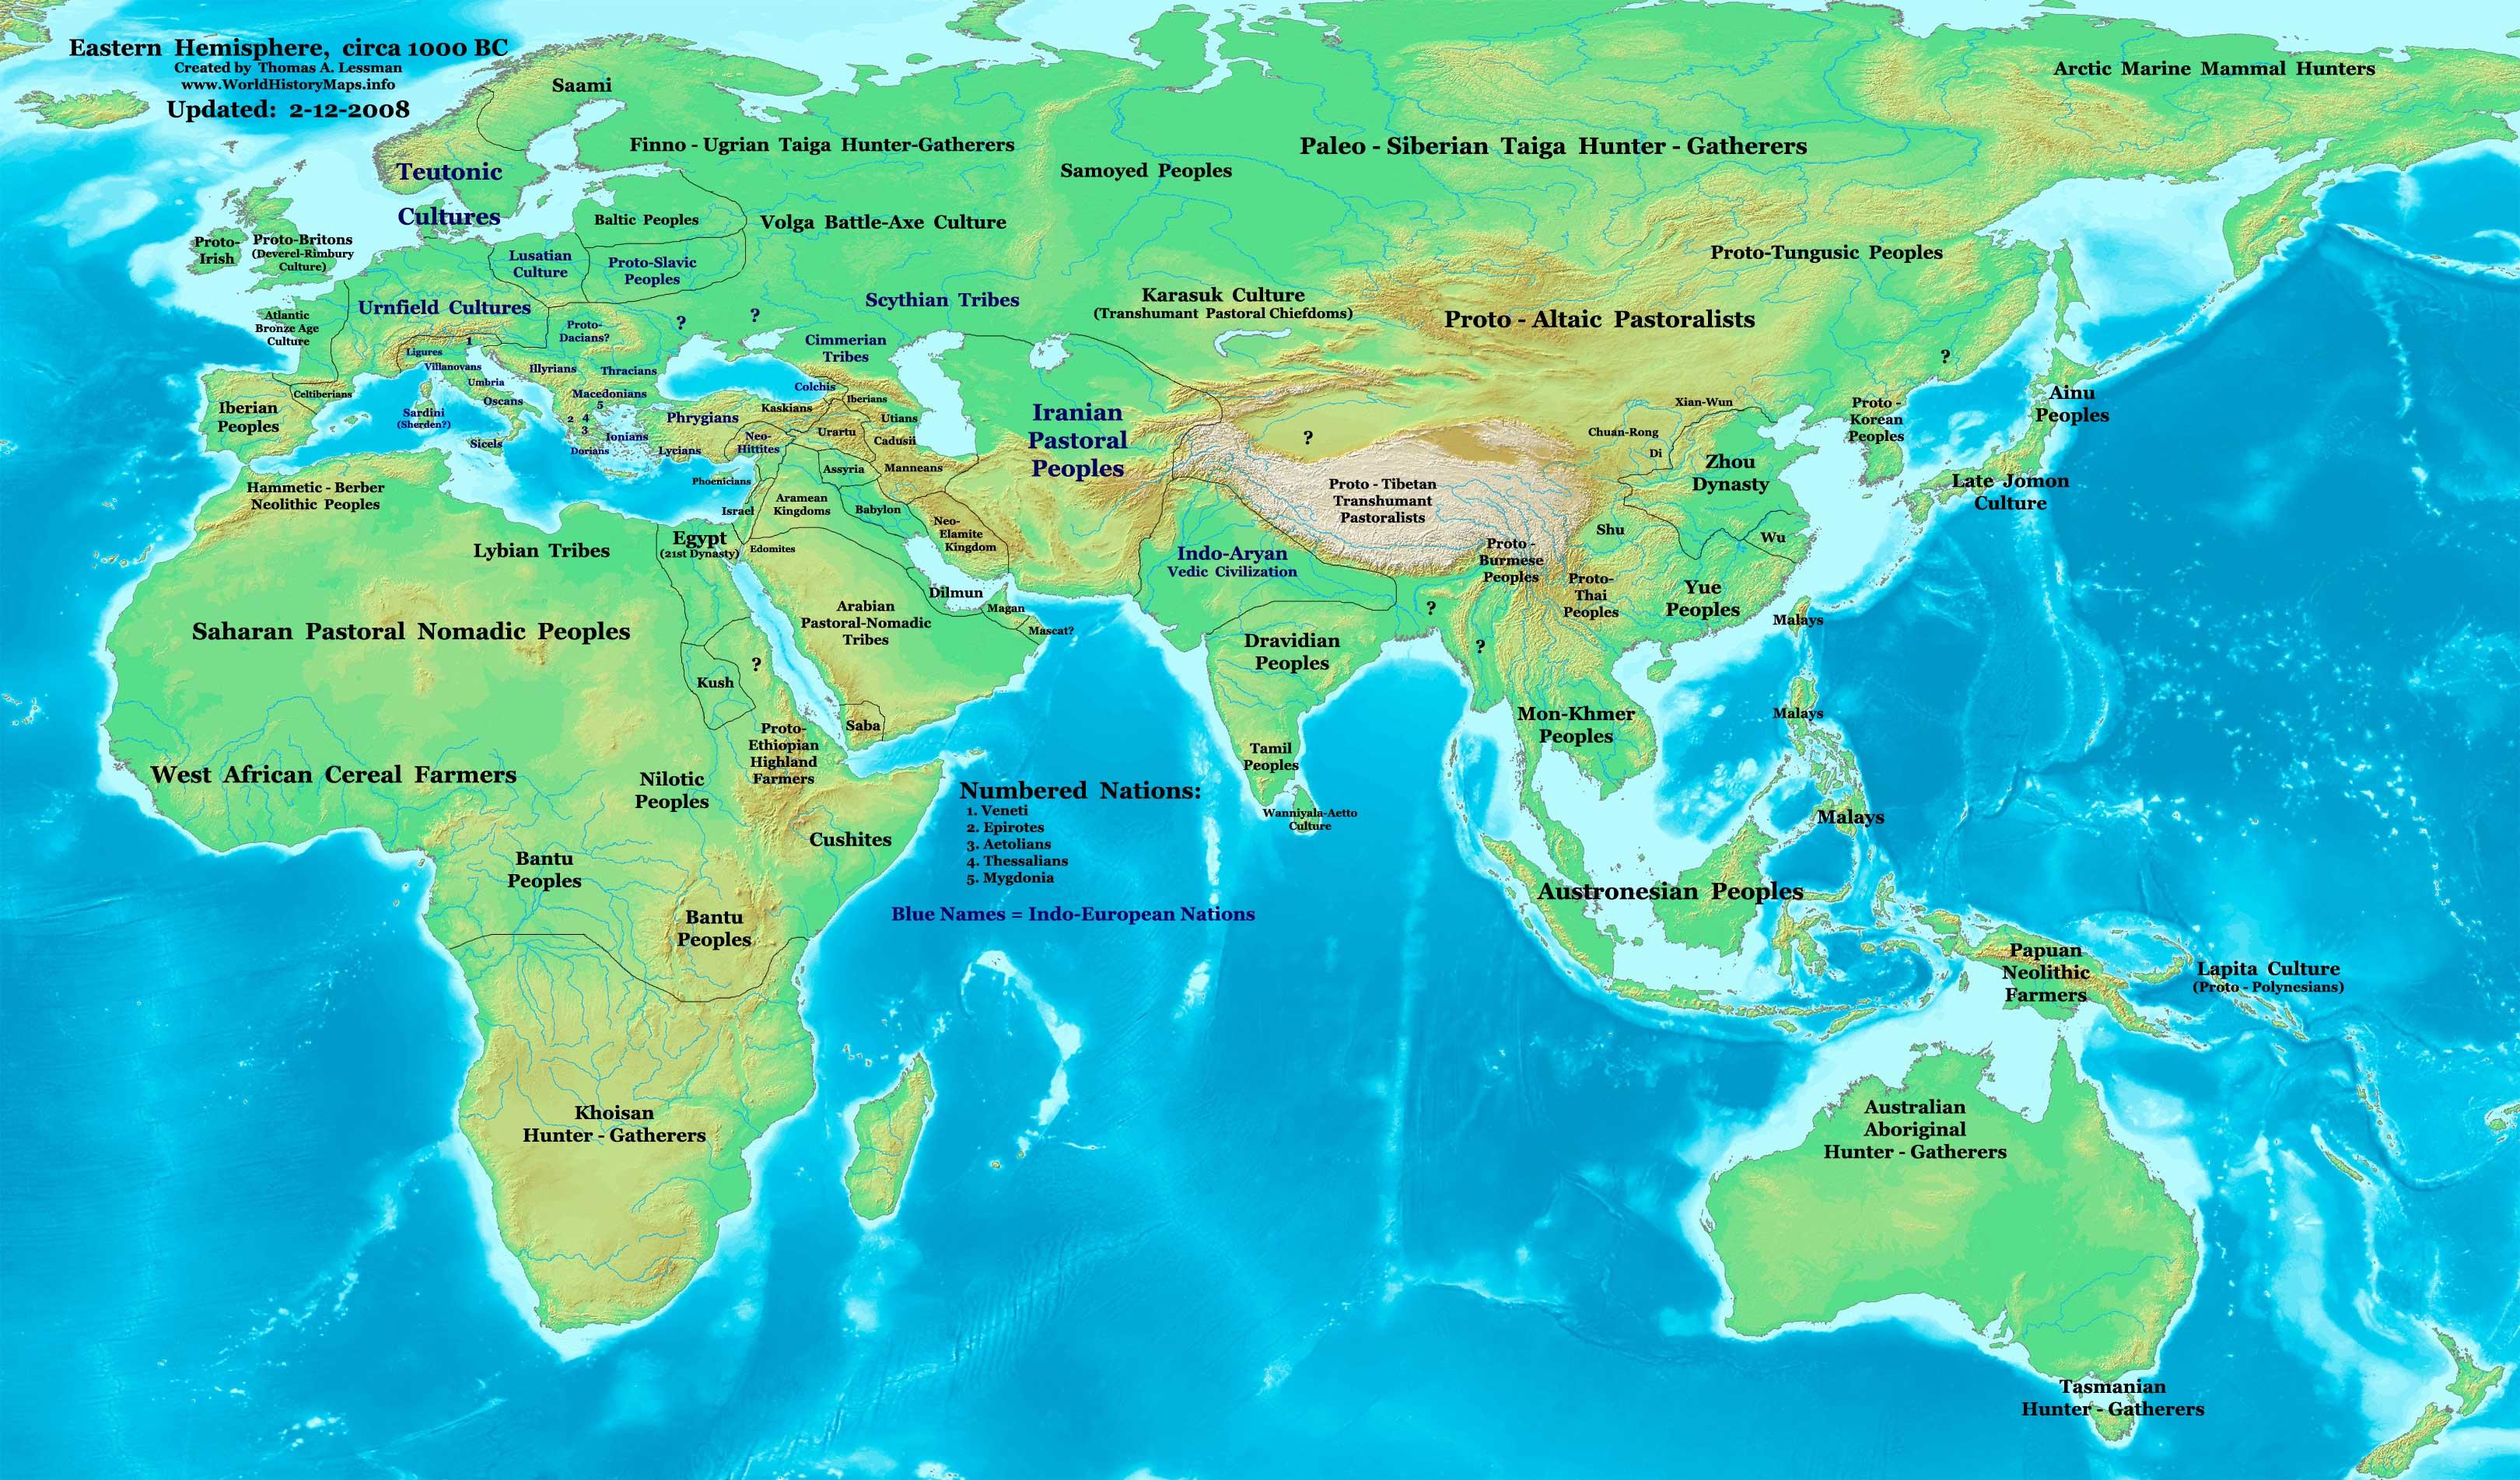 https://i1.wp.com/www.worldhistorymaps.info/images/East-Hem_1000bc.jpg